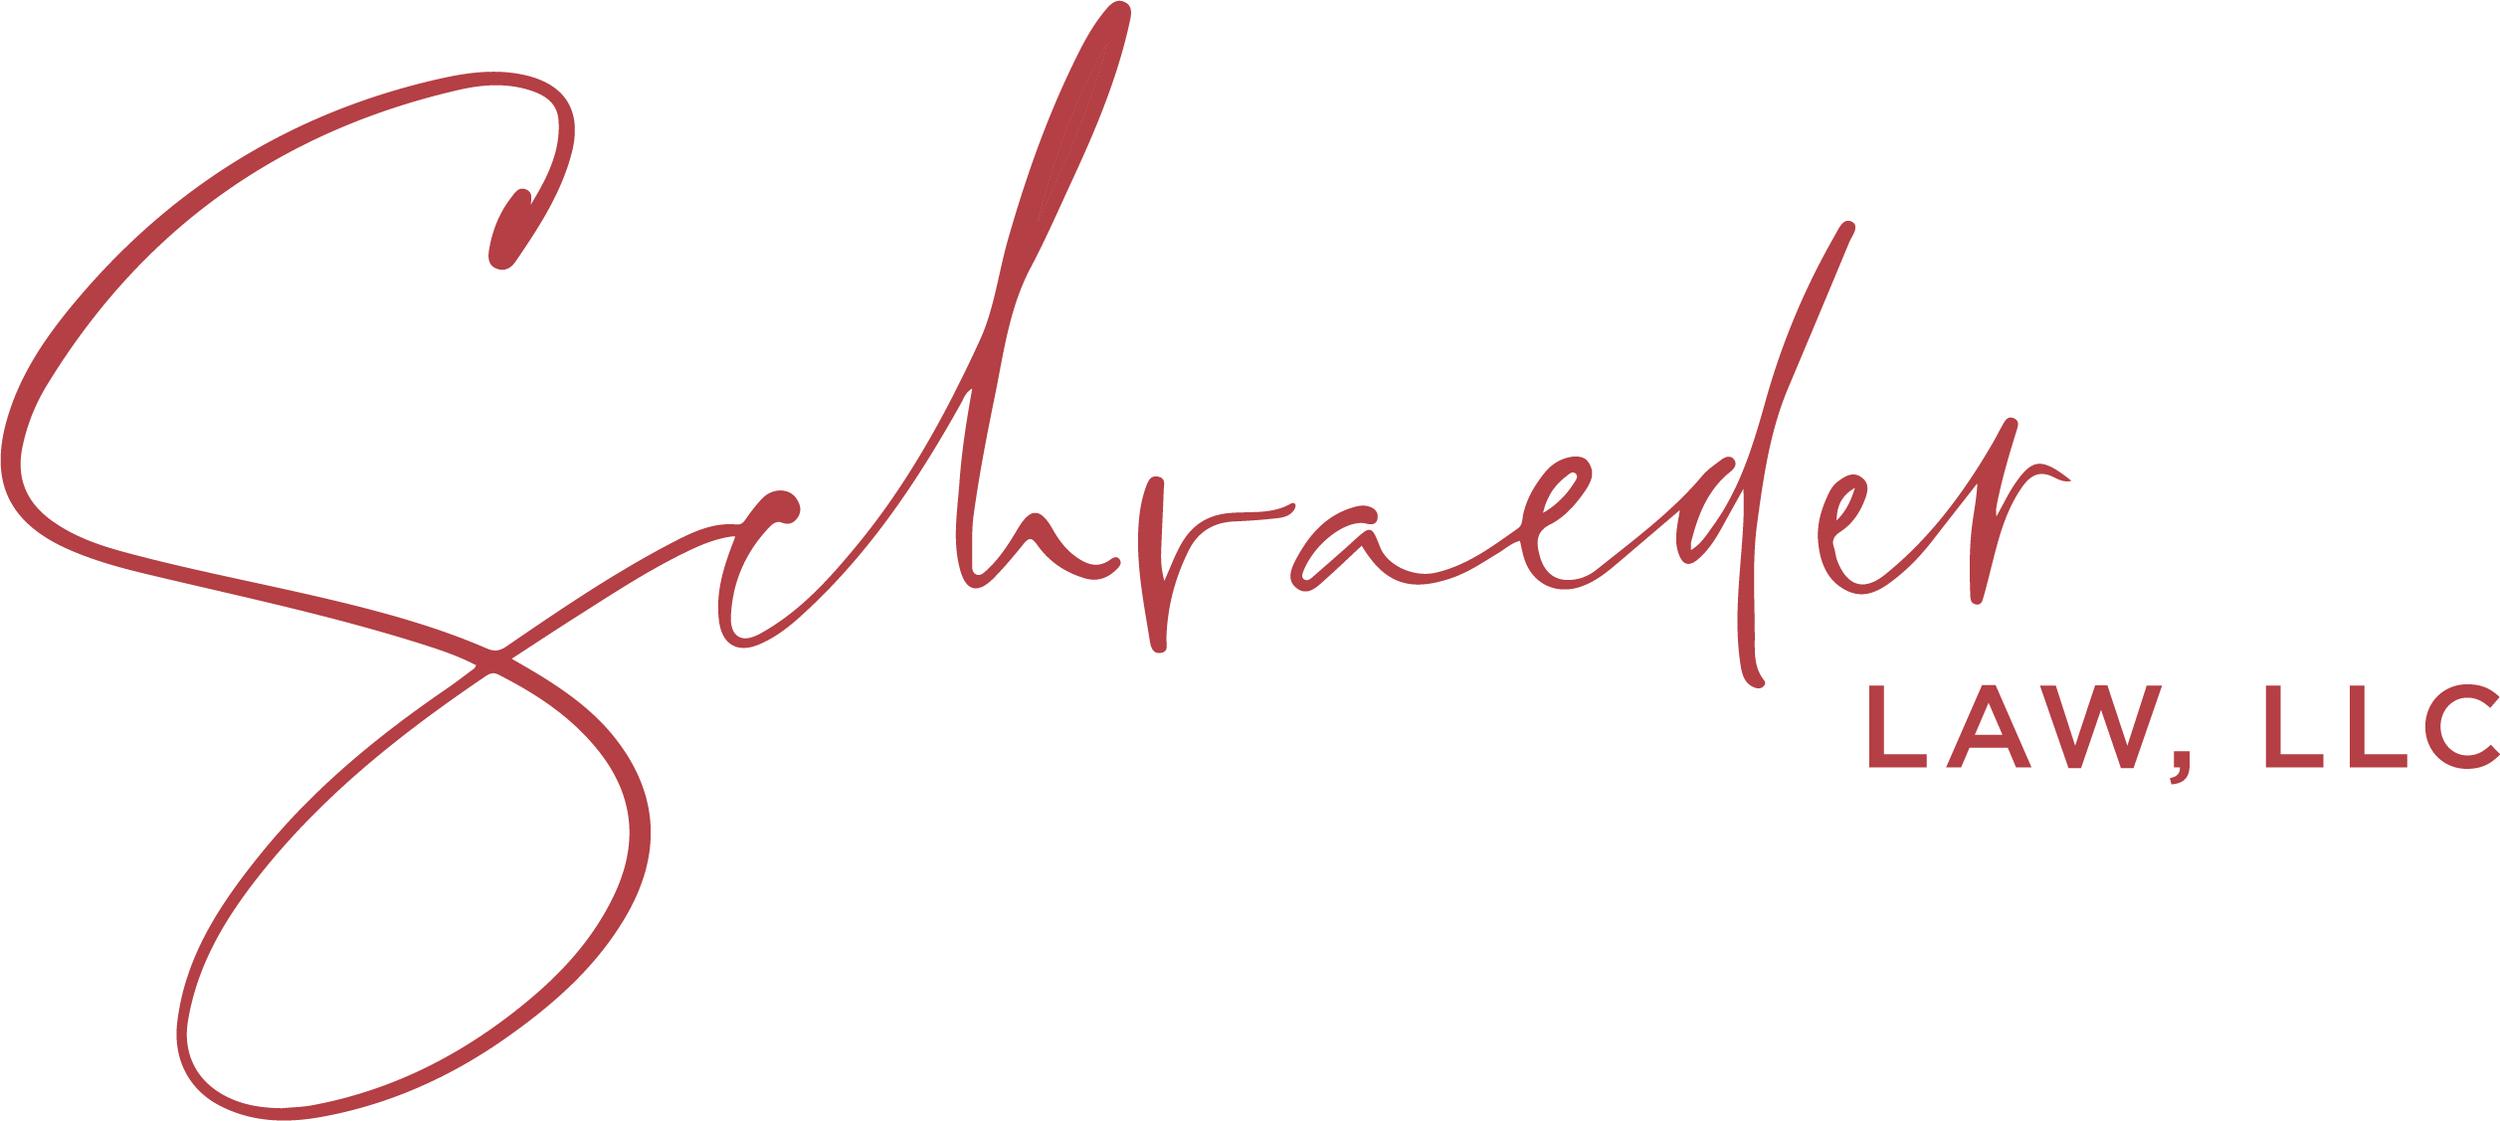 schraeder logo.png